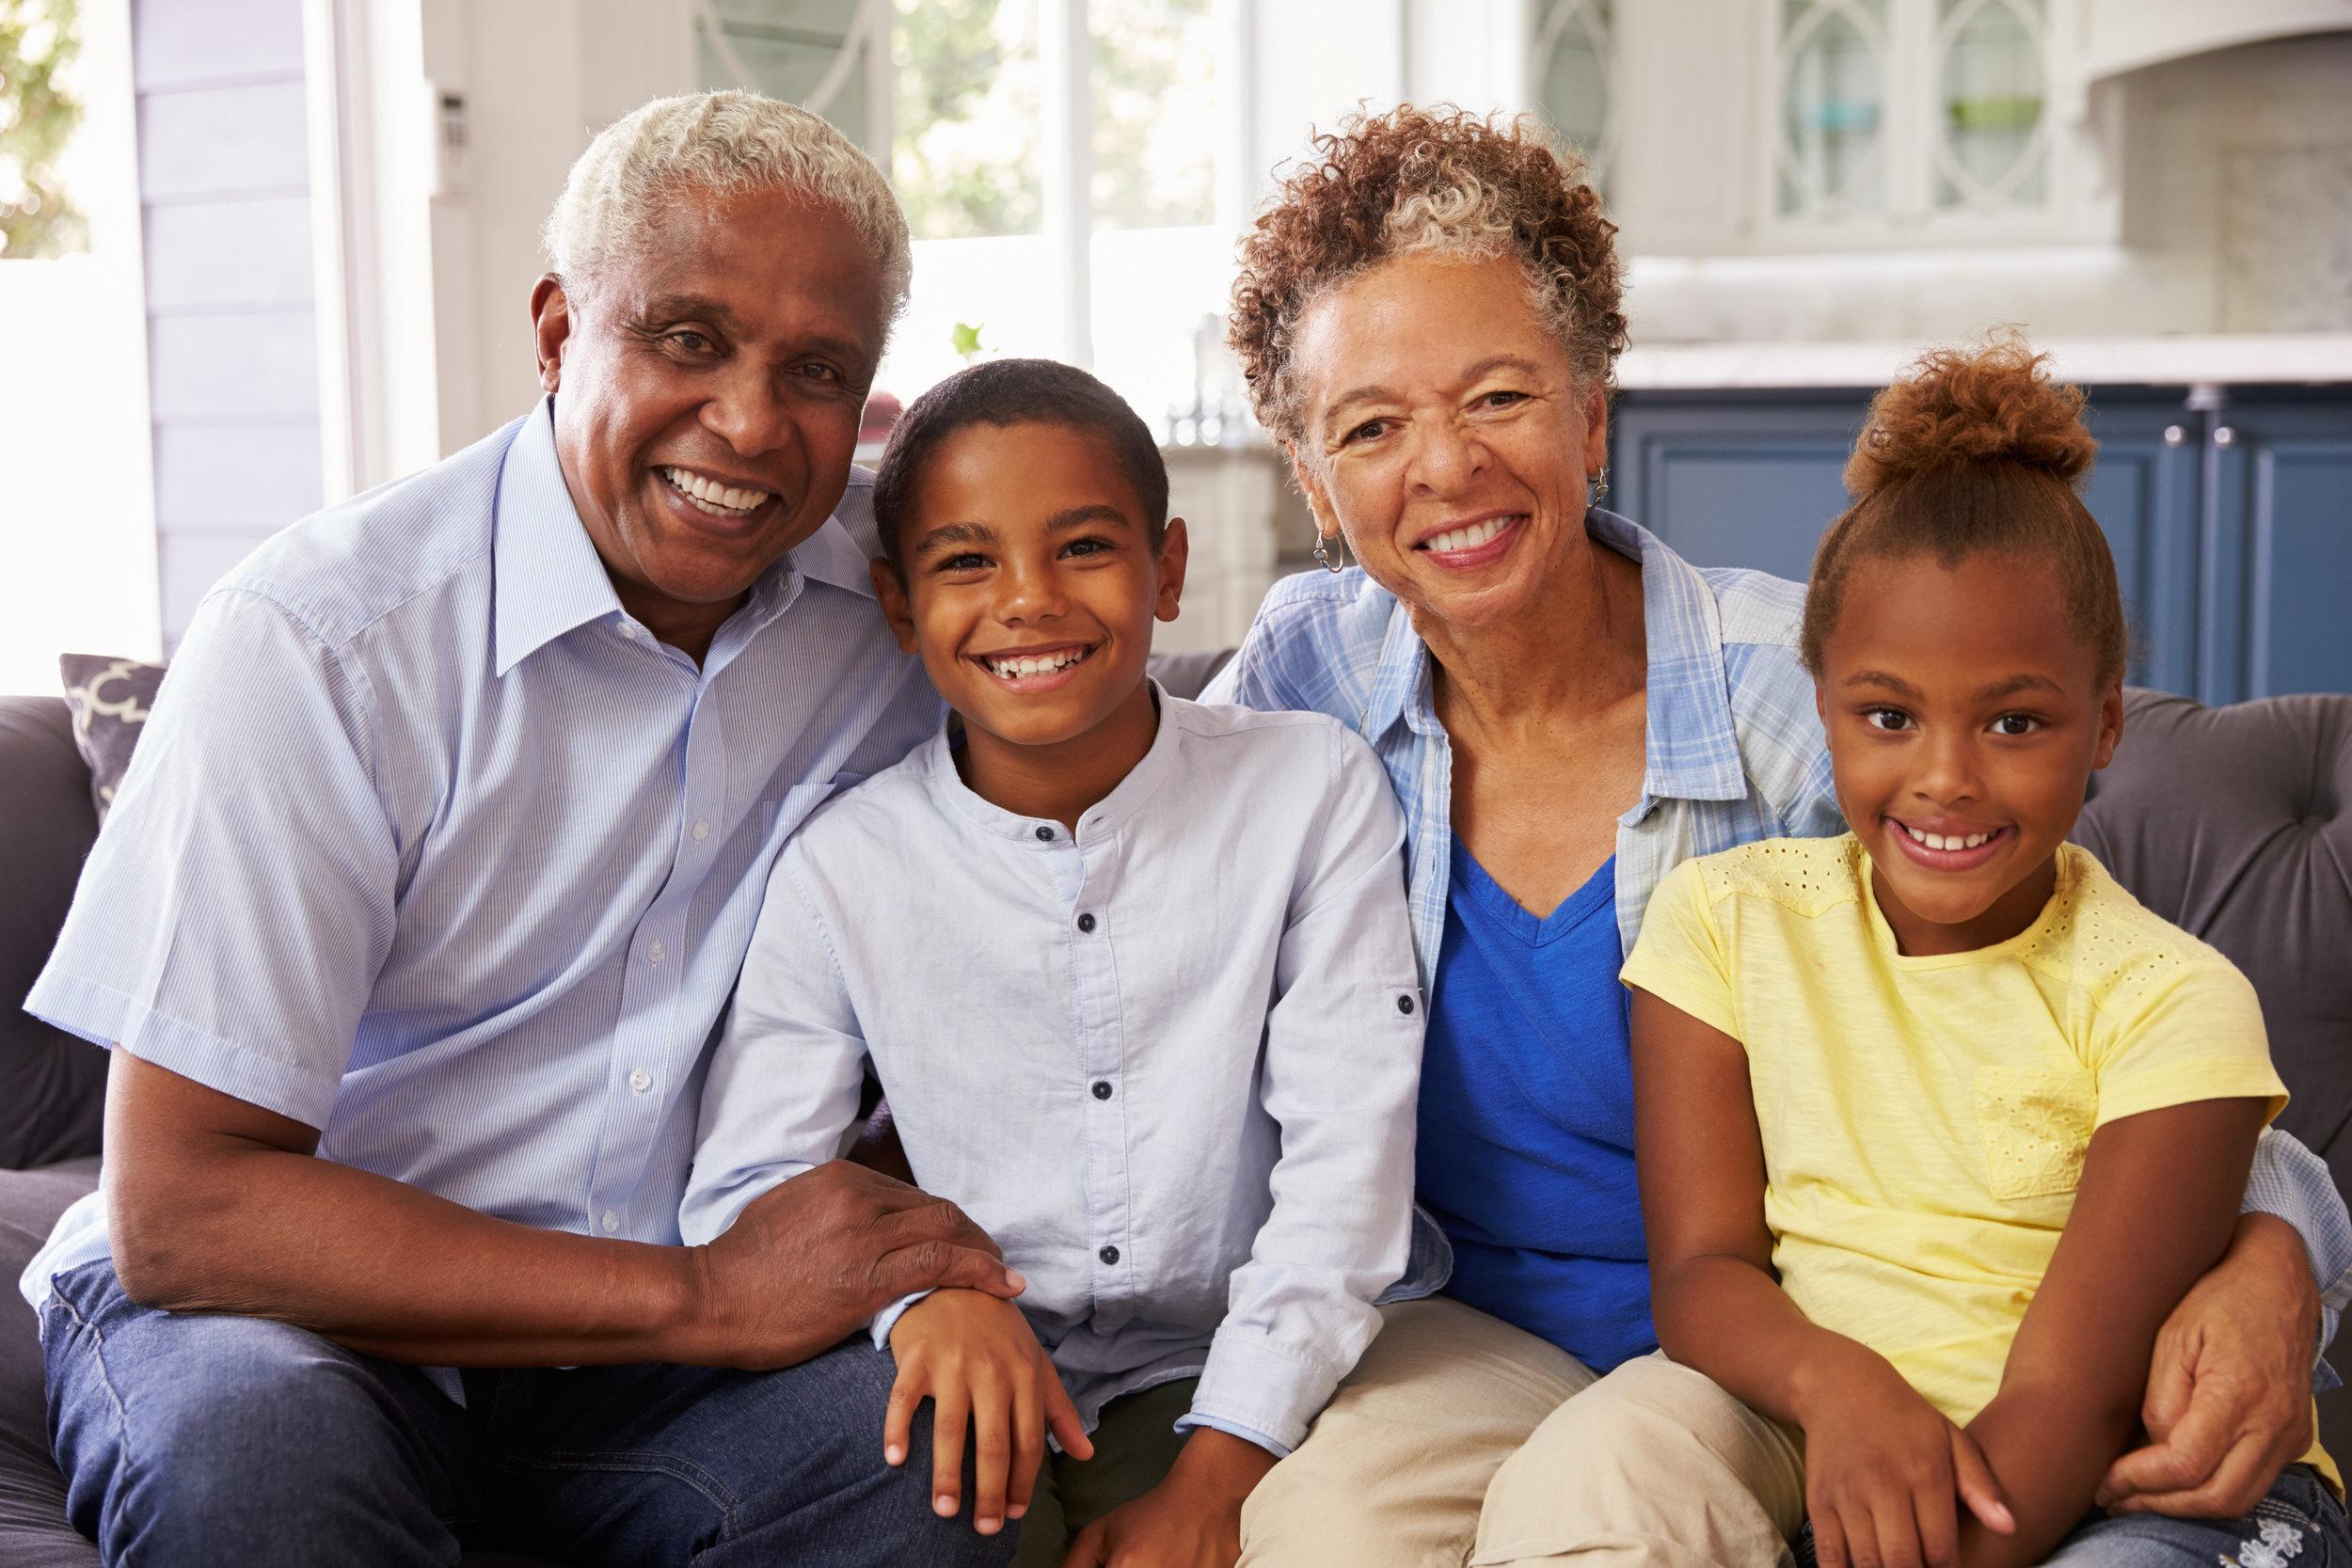 grandparents_with_grandchildren.jpg